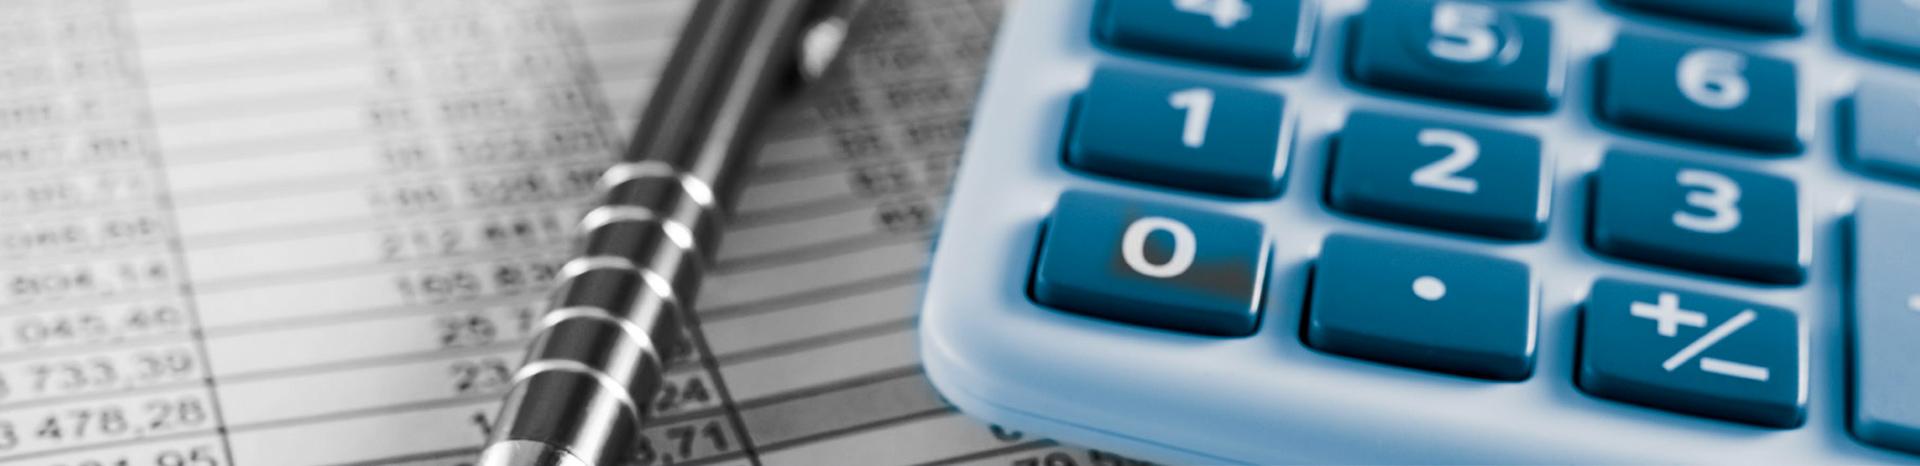 Letselschade bedragen berekenen | LetselPro